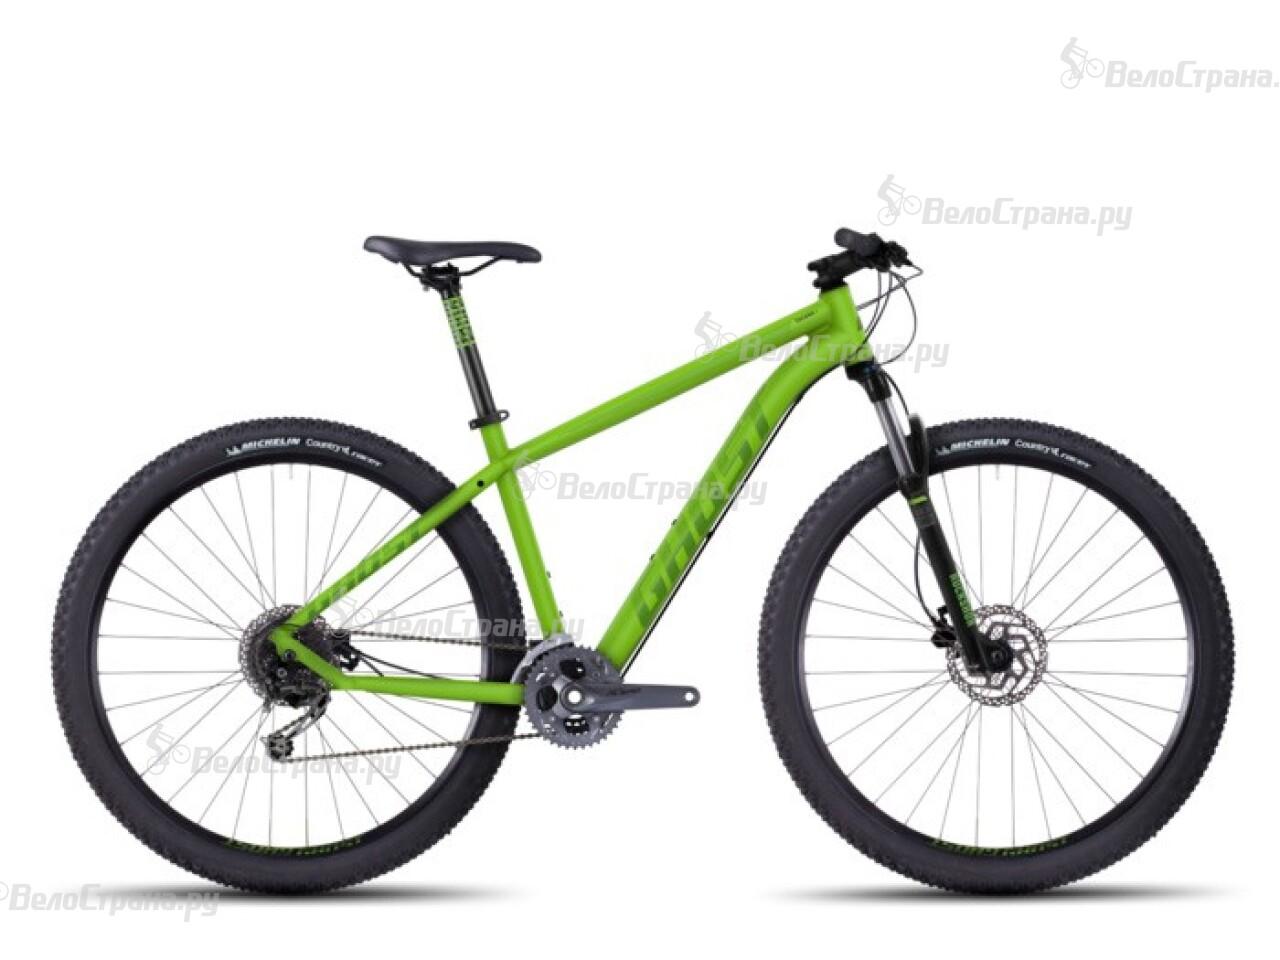 Велосипед Ghost Tacana 4 (2016) цены онлайн